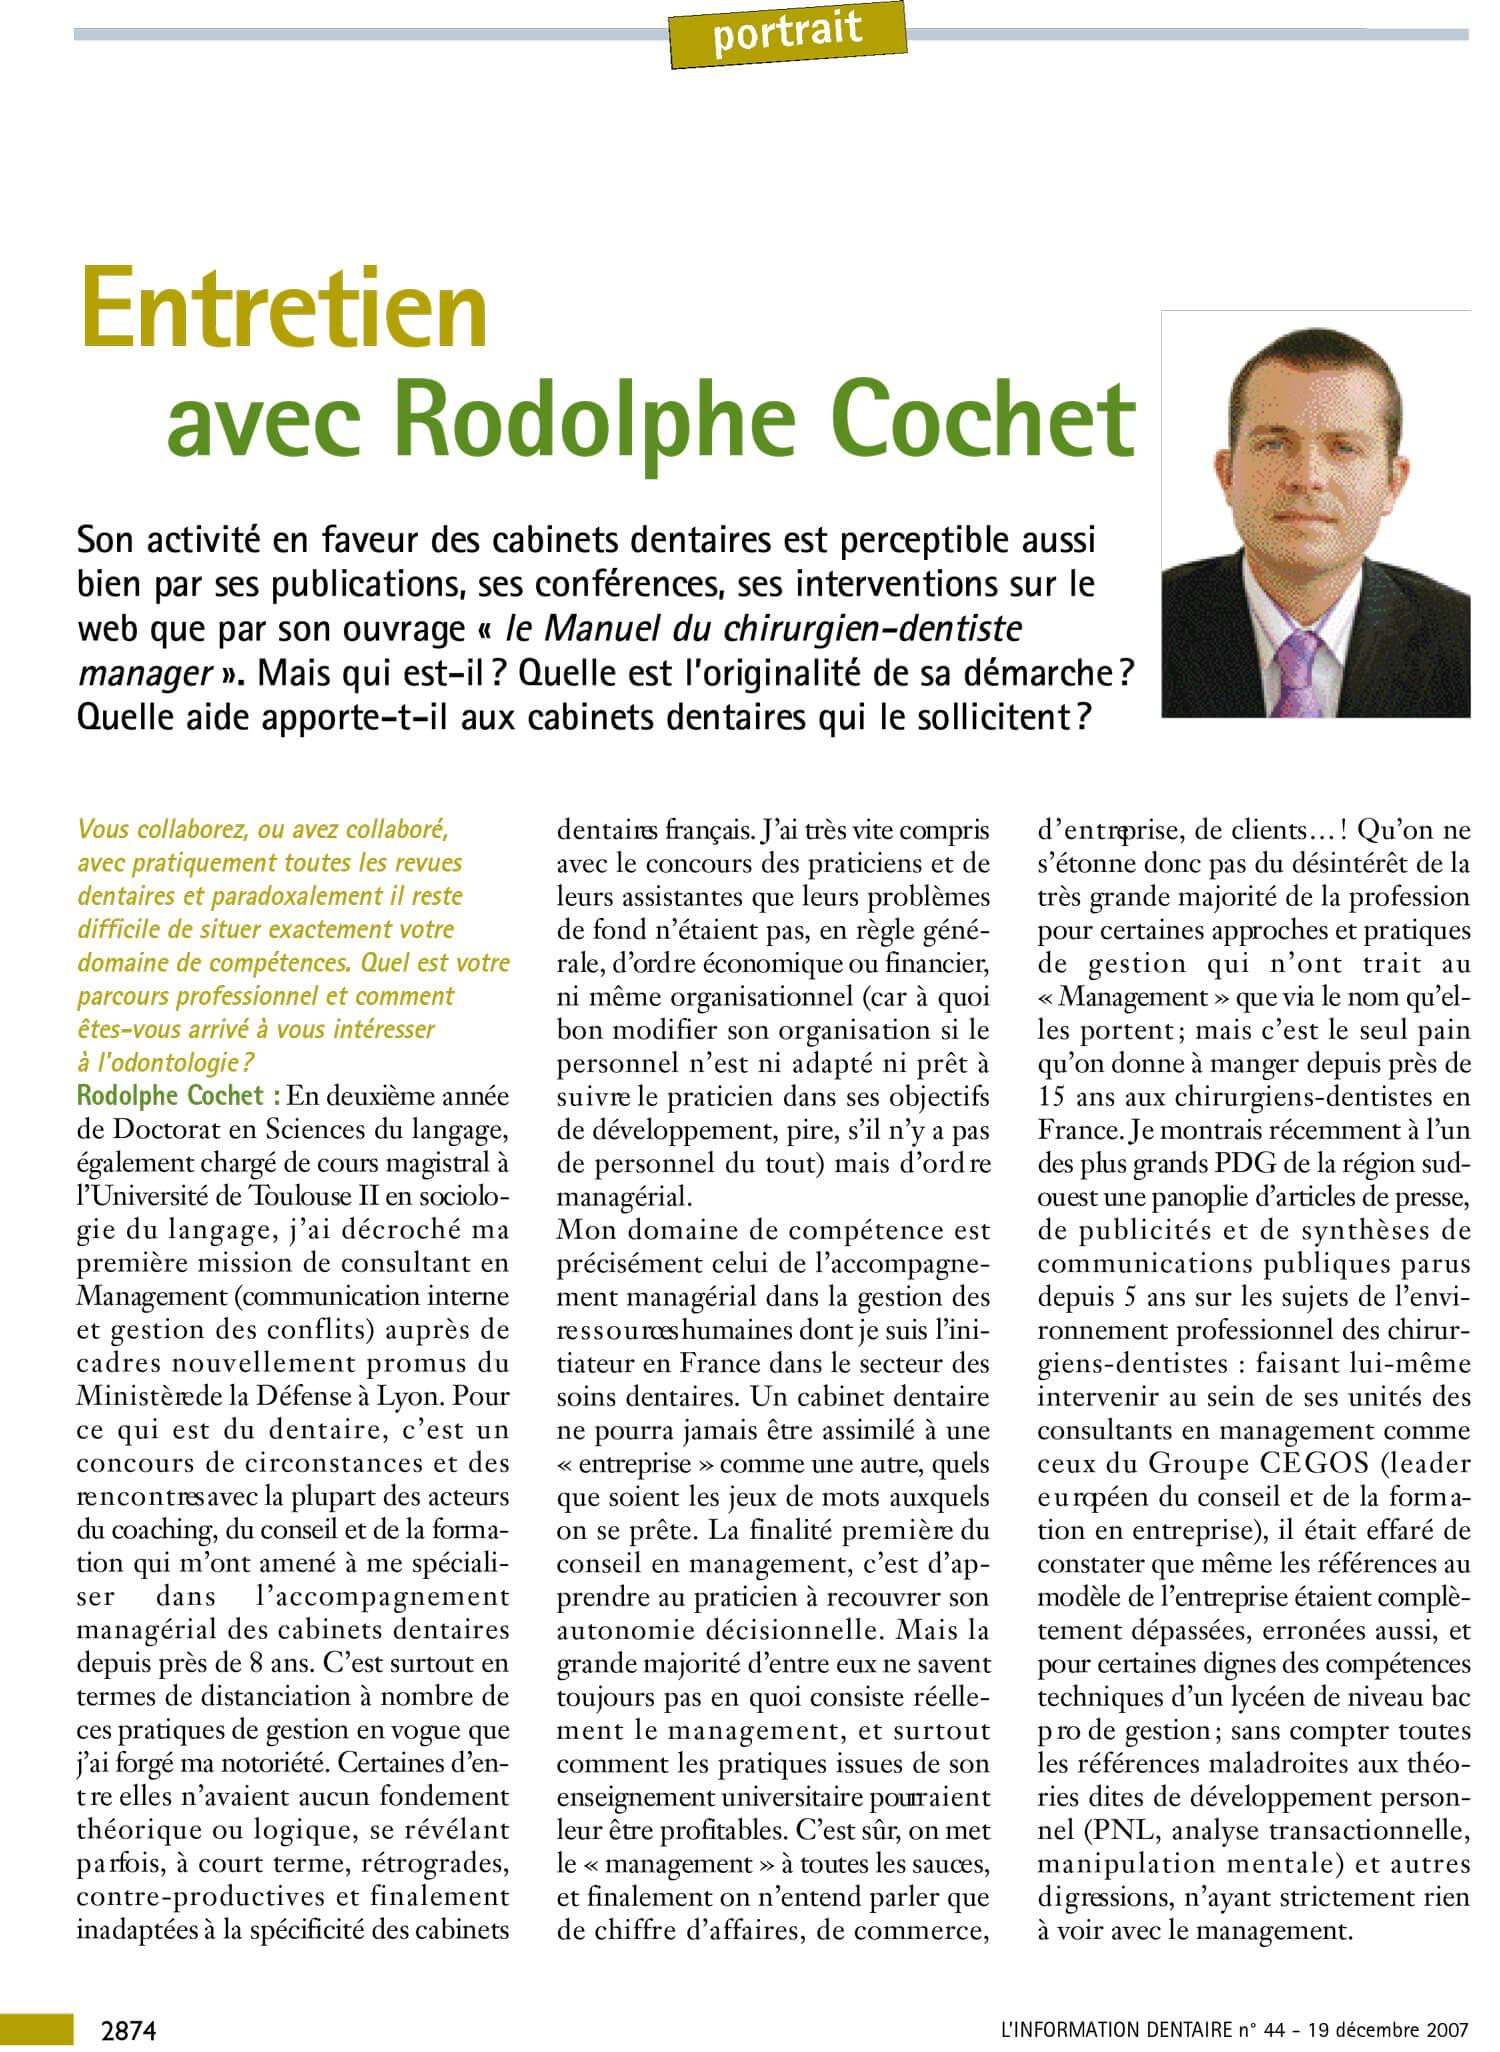 Information_Dentaire_Entretien_exclusif_avec_Rodolphe_Cochet.jpg